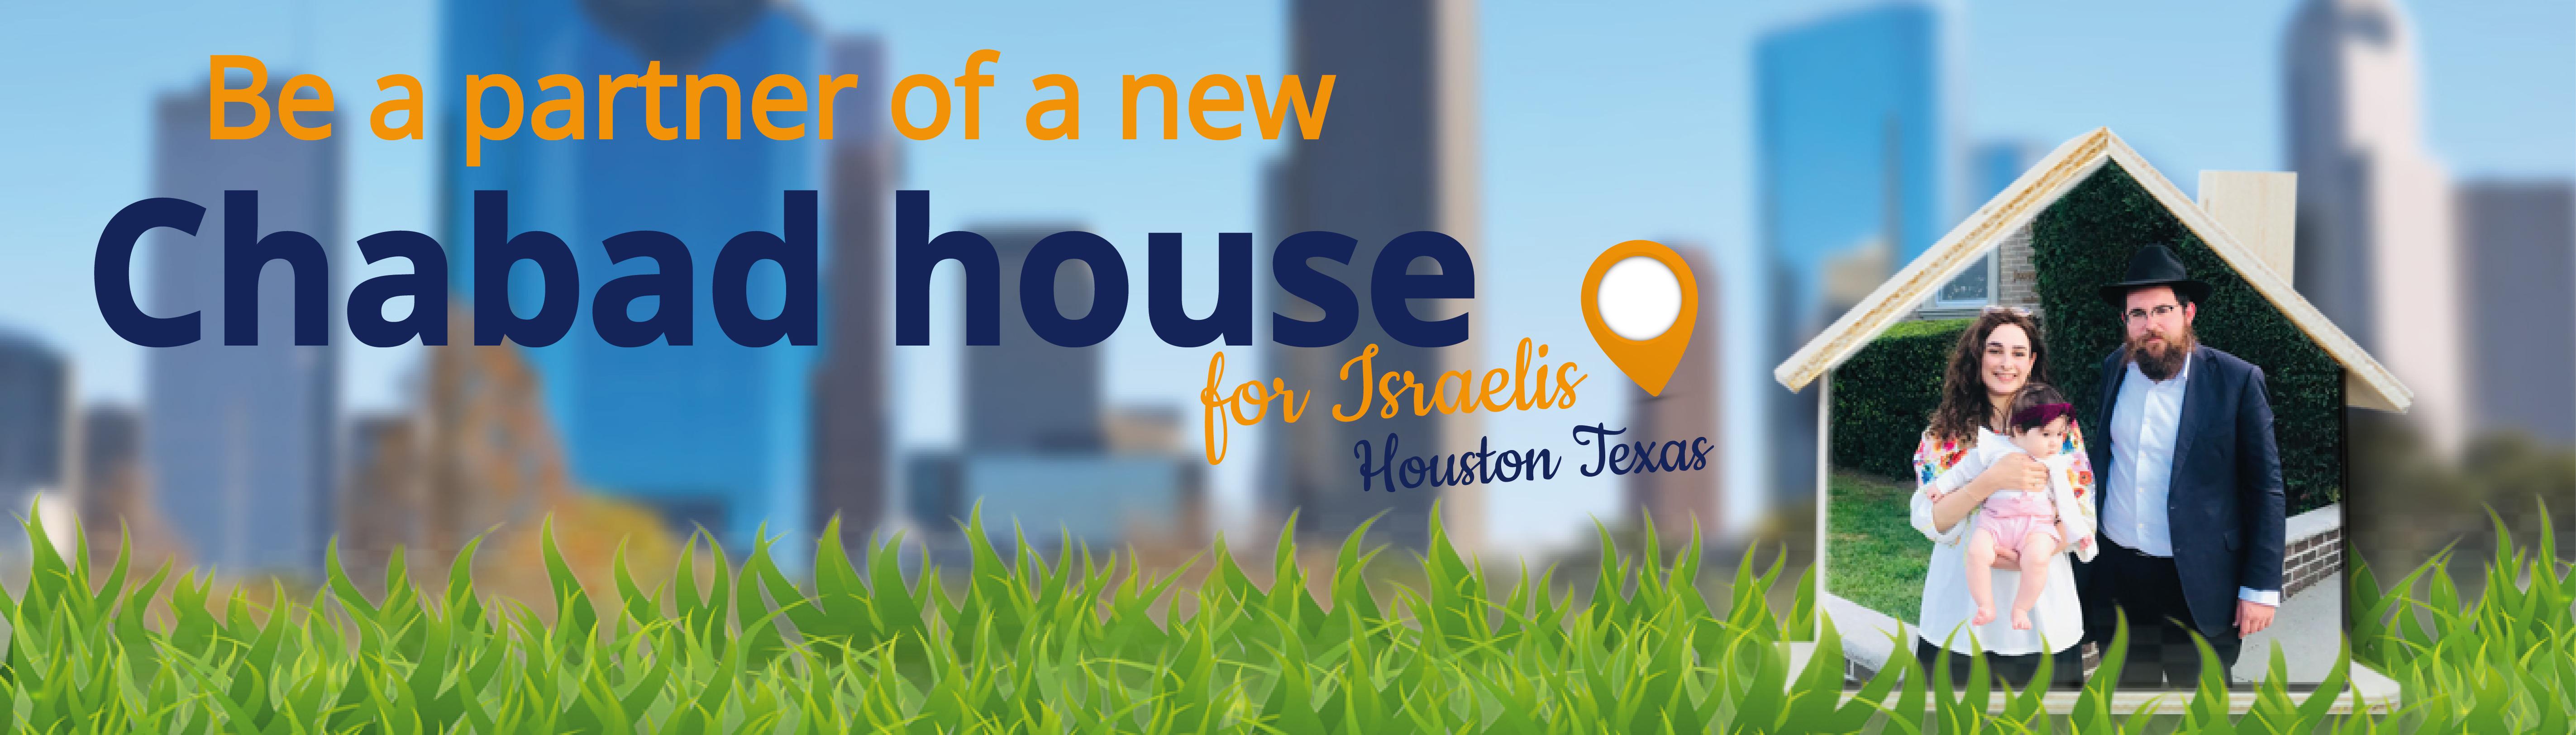 Chabad House for Israelis Houston Texas Menny and Perry Raytshik